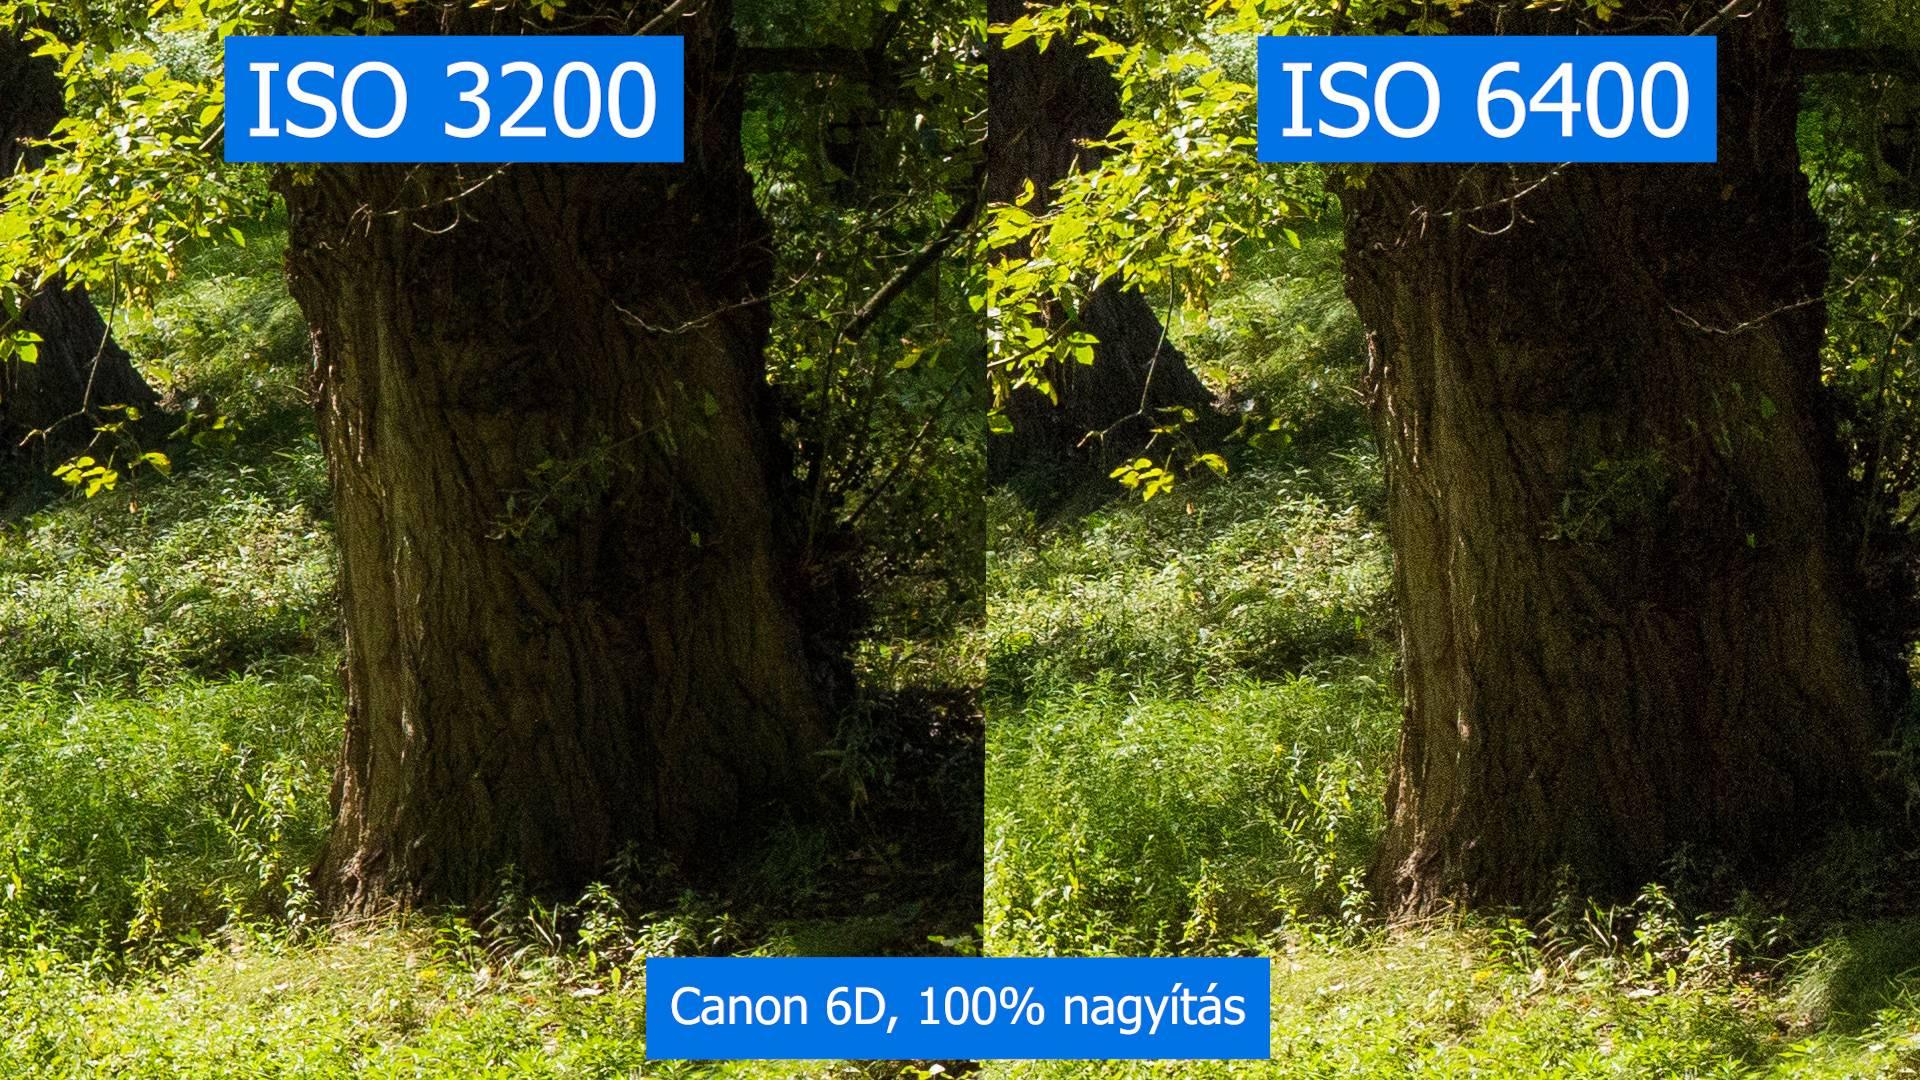 canon 6d iso 3200 vs iso 6400